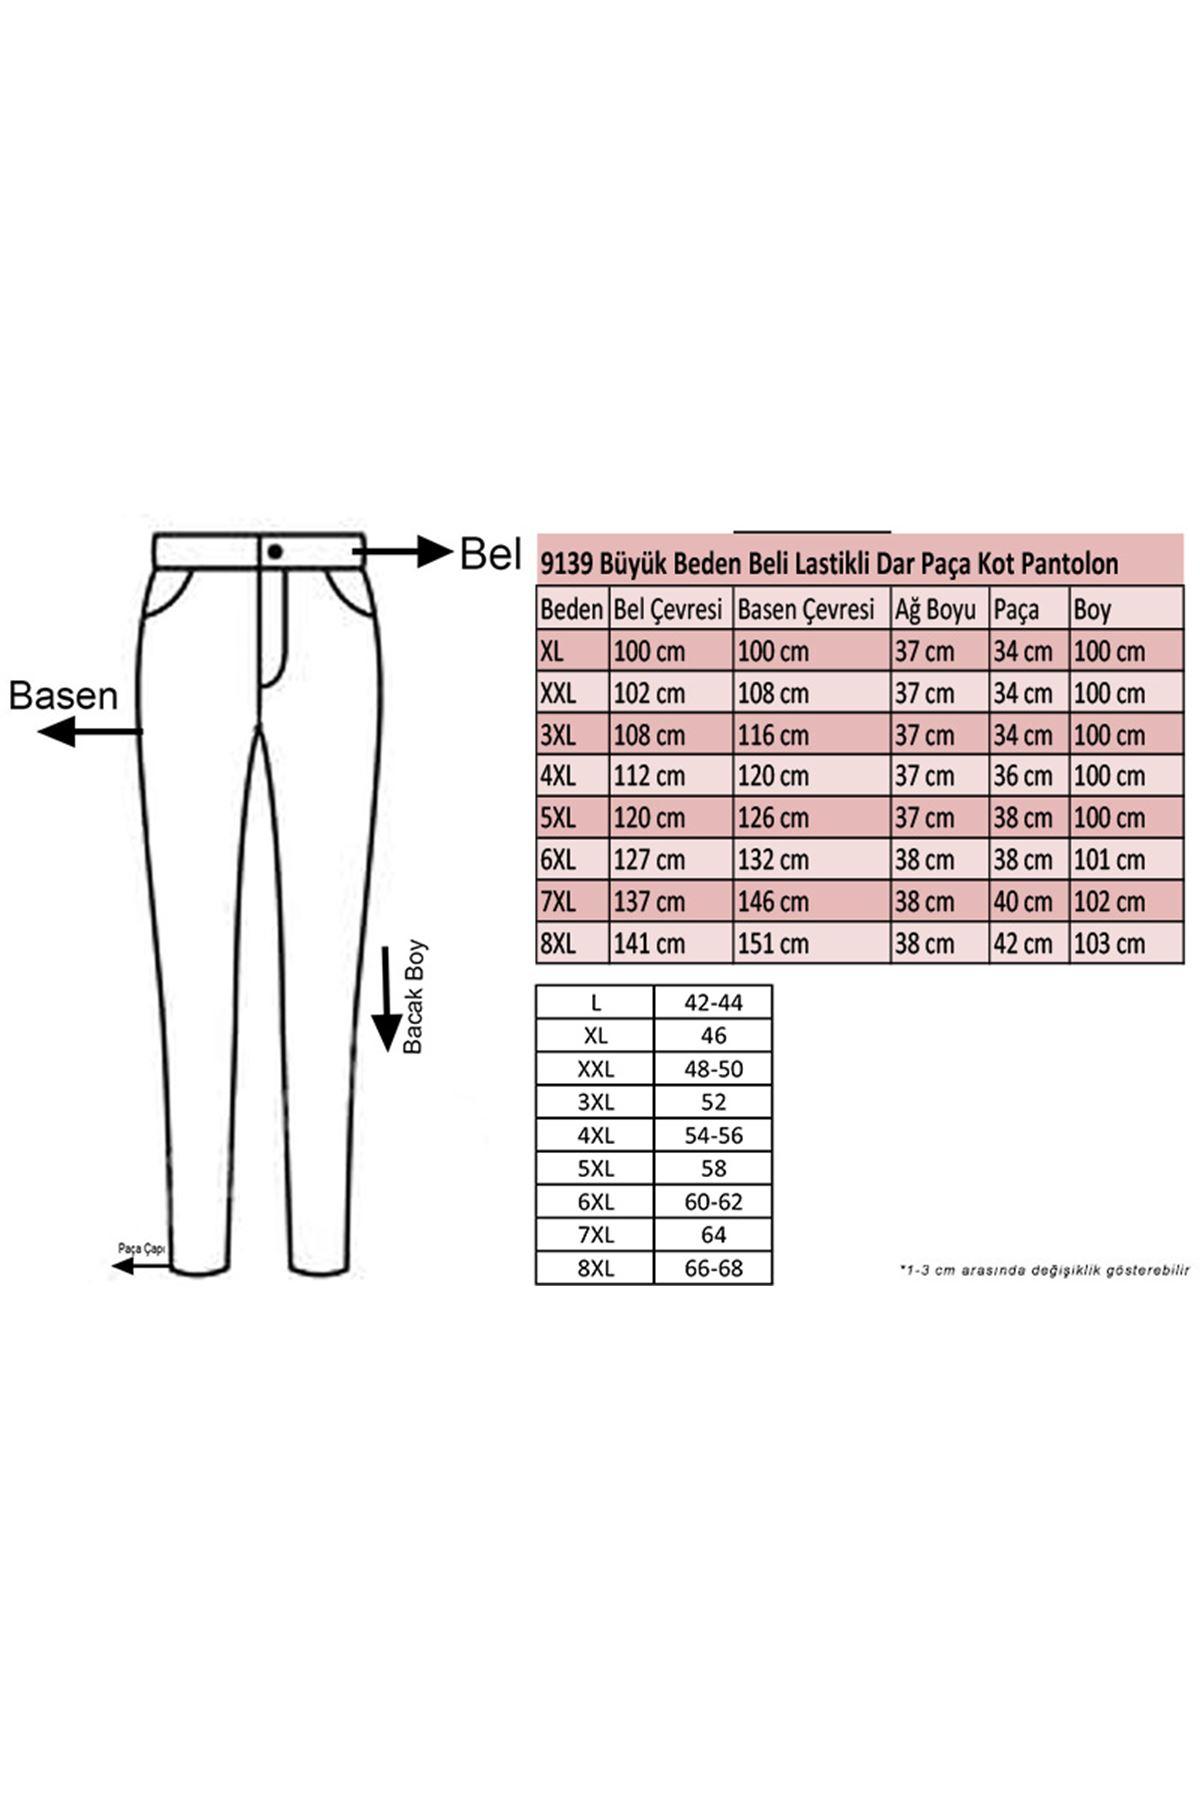 9139 Büyük Beden Beli Lastikli Dar Paça Kot Pantalon-Lacivert